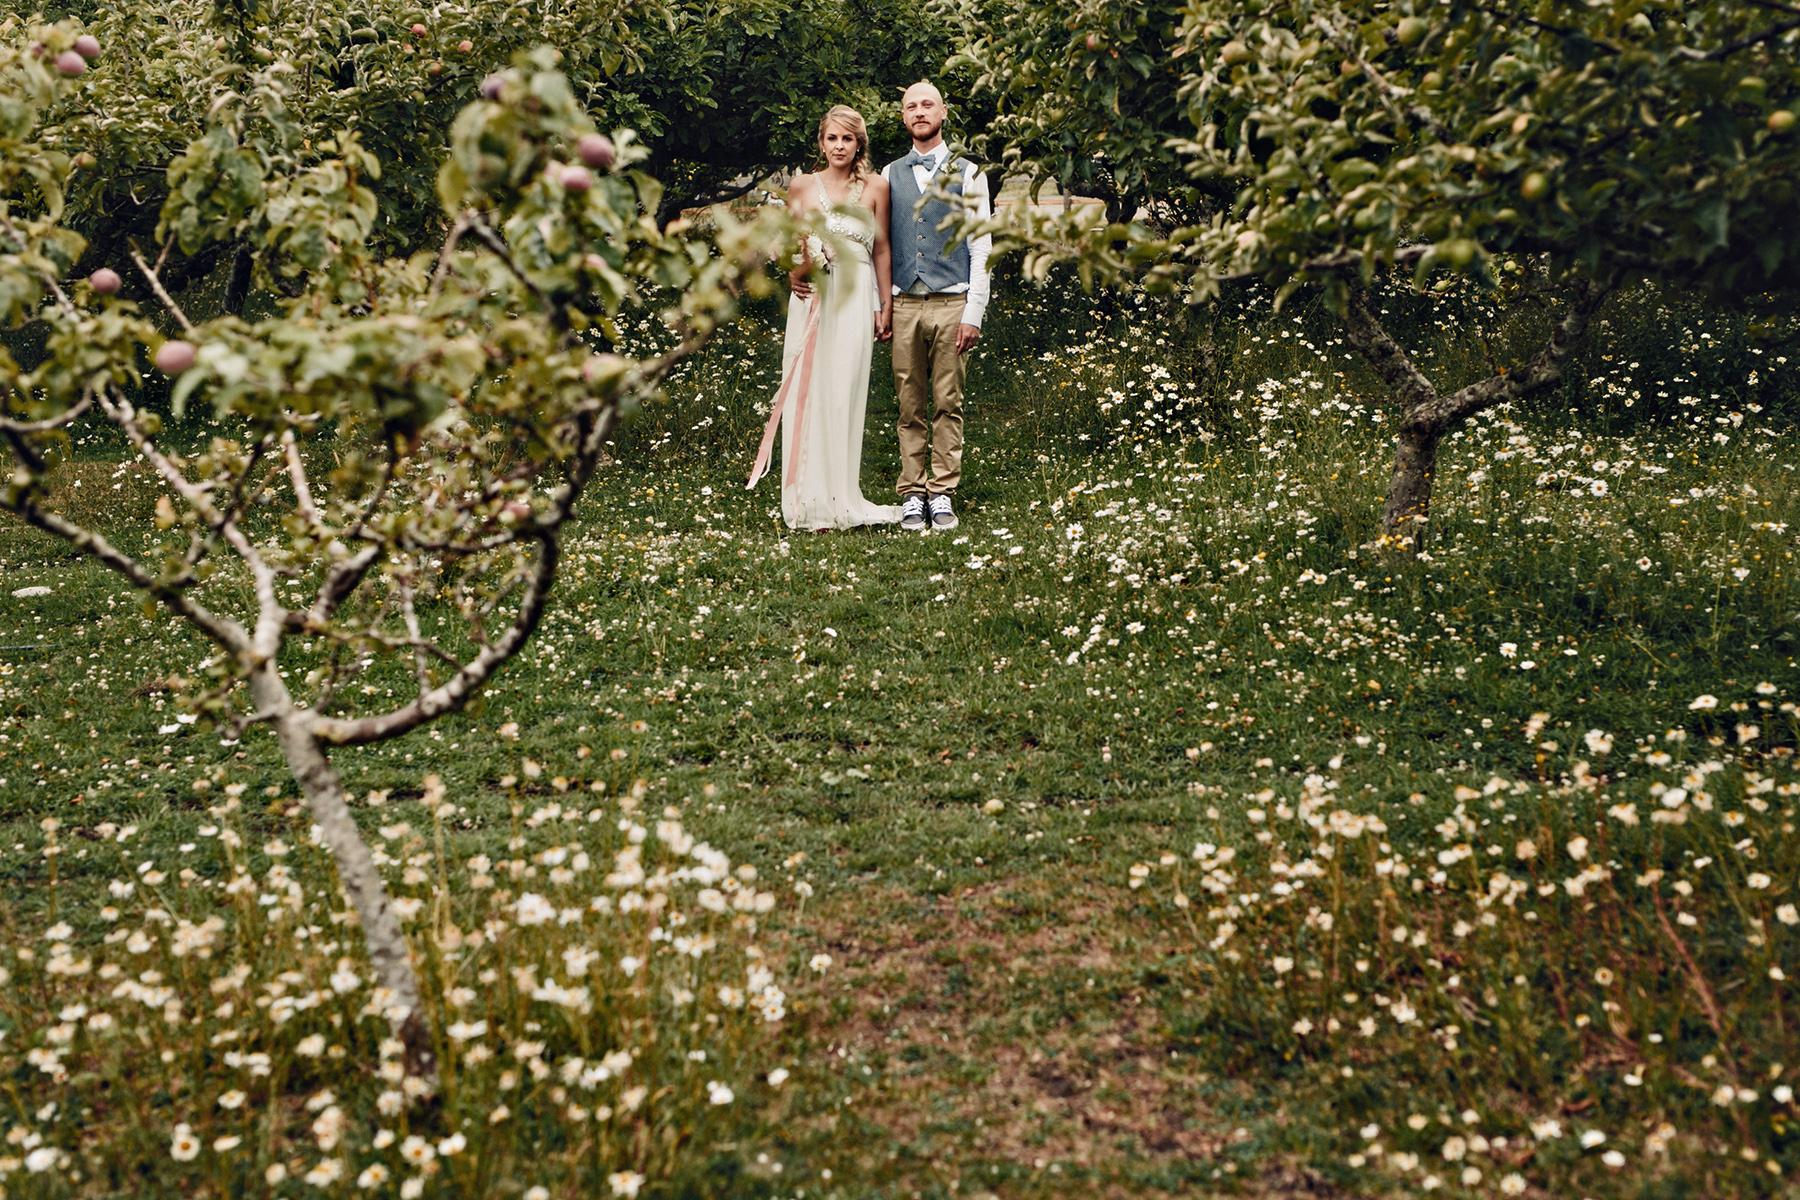 kildara-farms-wedding-photo-inspiration-0064